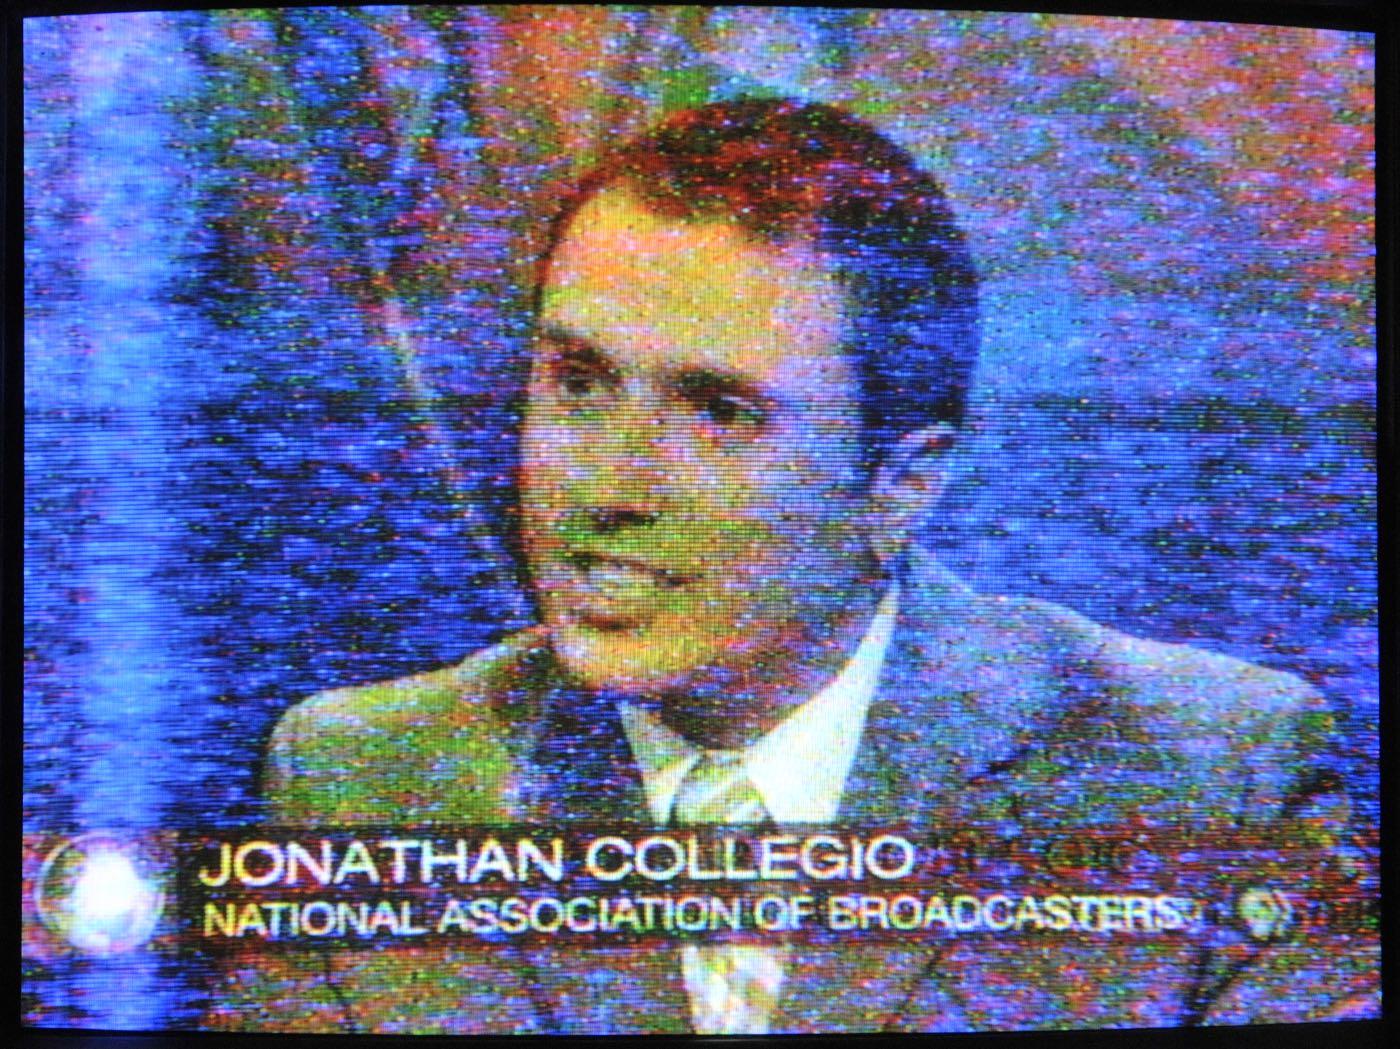 Off-air shot of PBS News Hour, June 12 2009